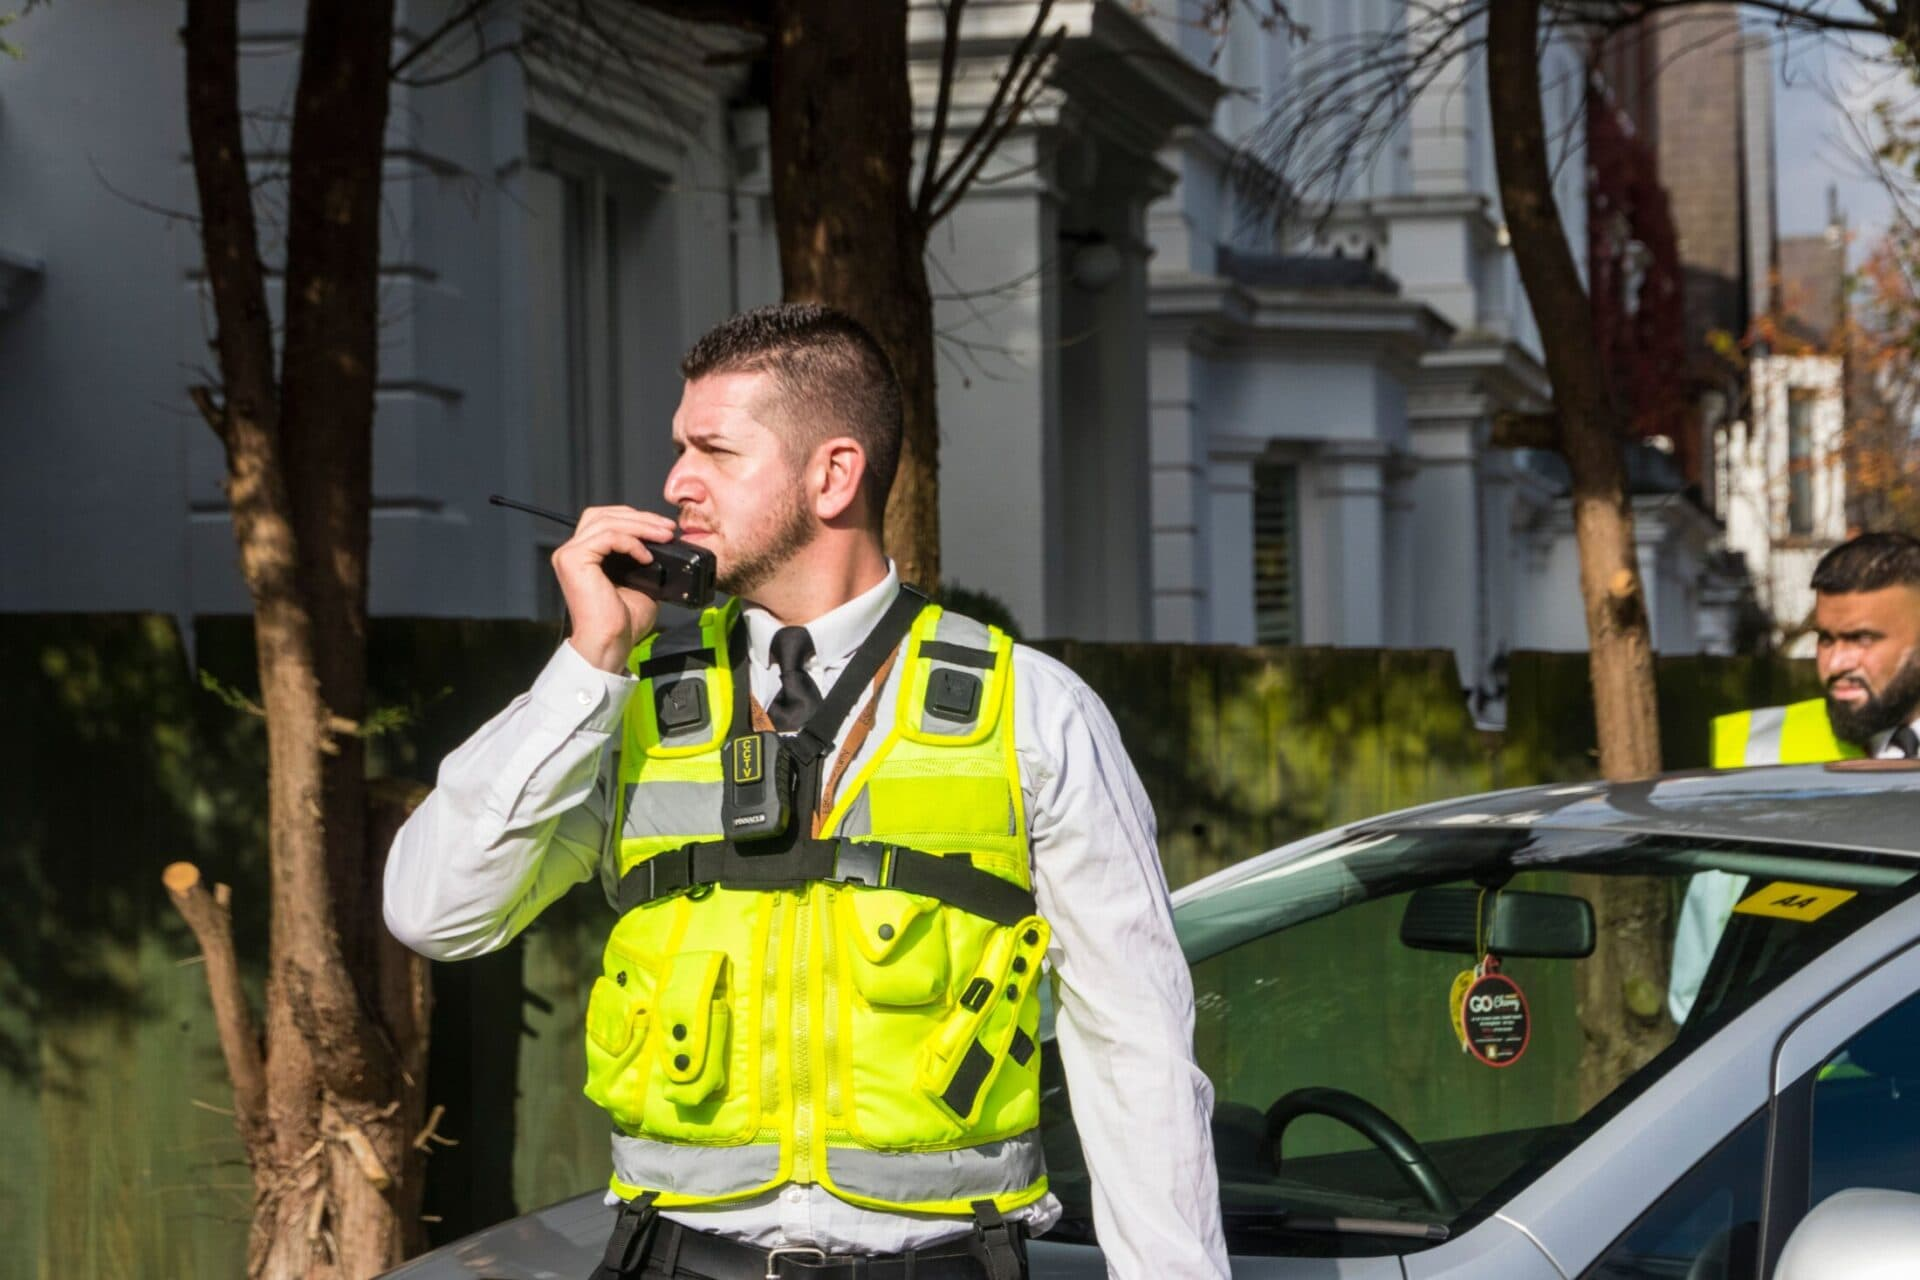 Security guard talking into walkie talkie